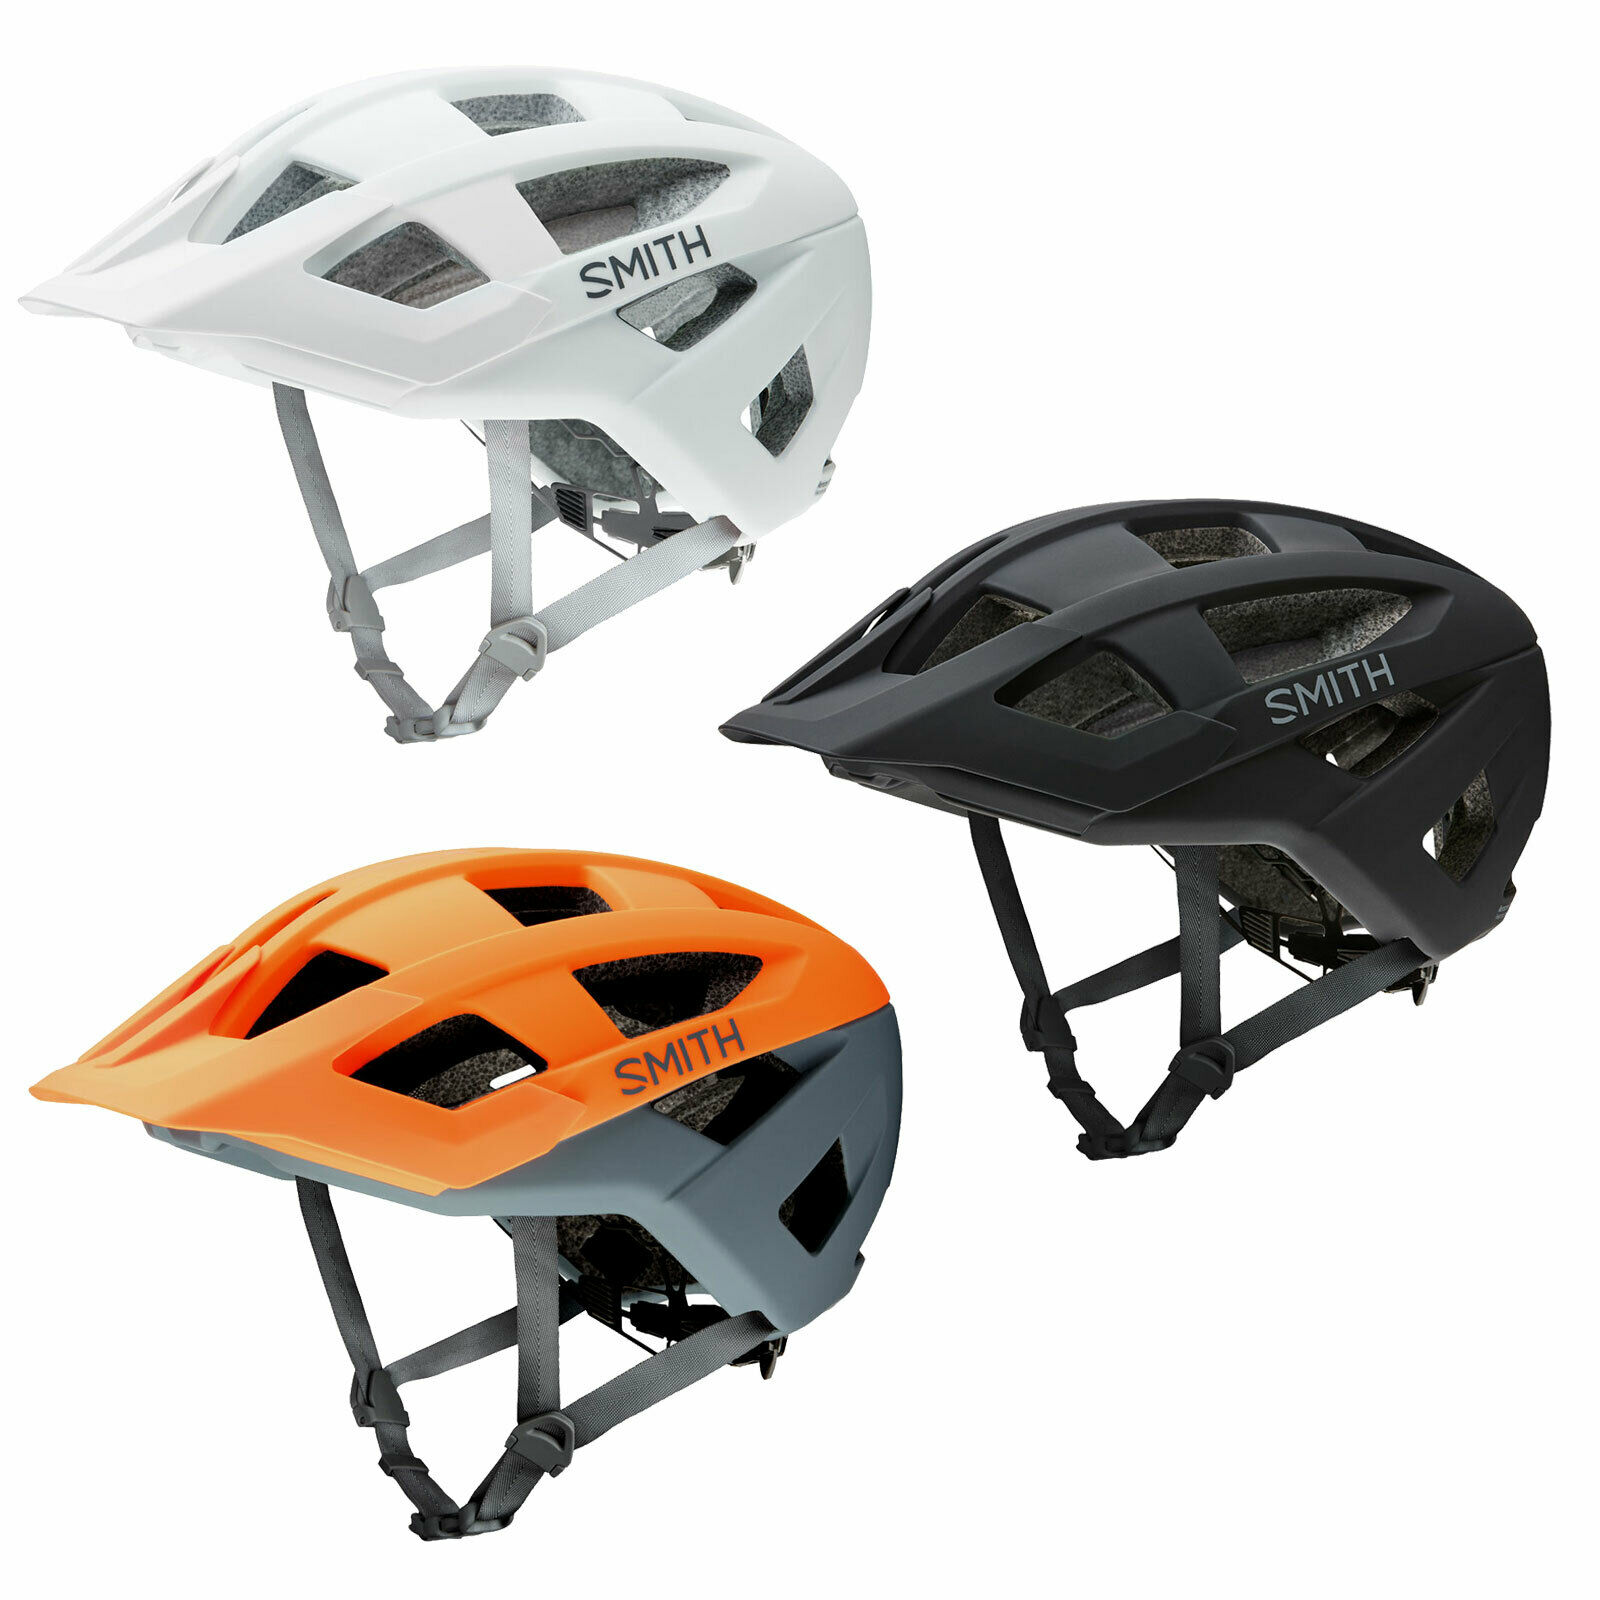 Smith Venture Helm Radhelm Fahrradhelm Fahrrad MTB Mountain Bike Radsporthelm